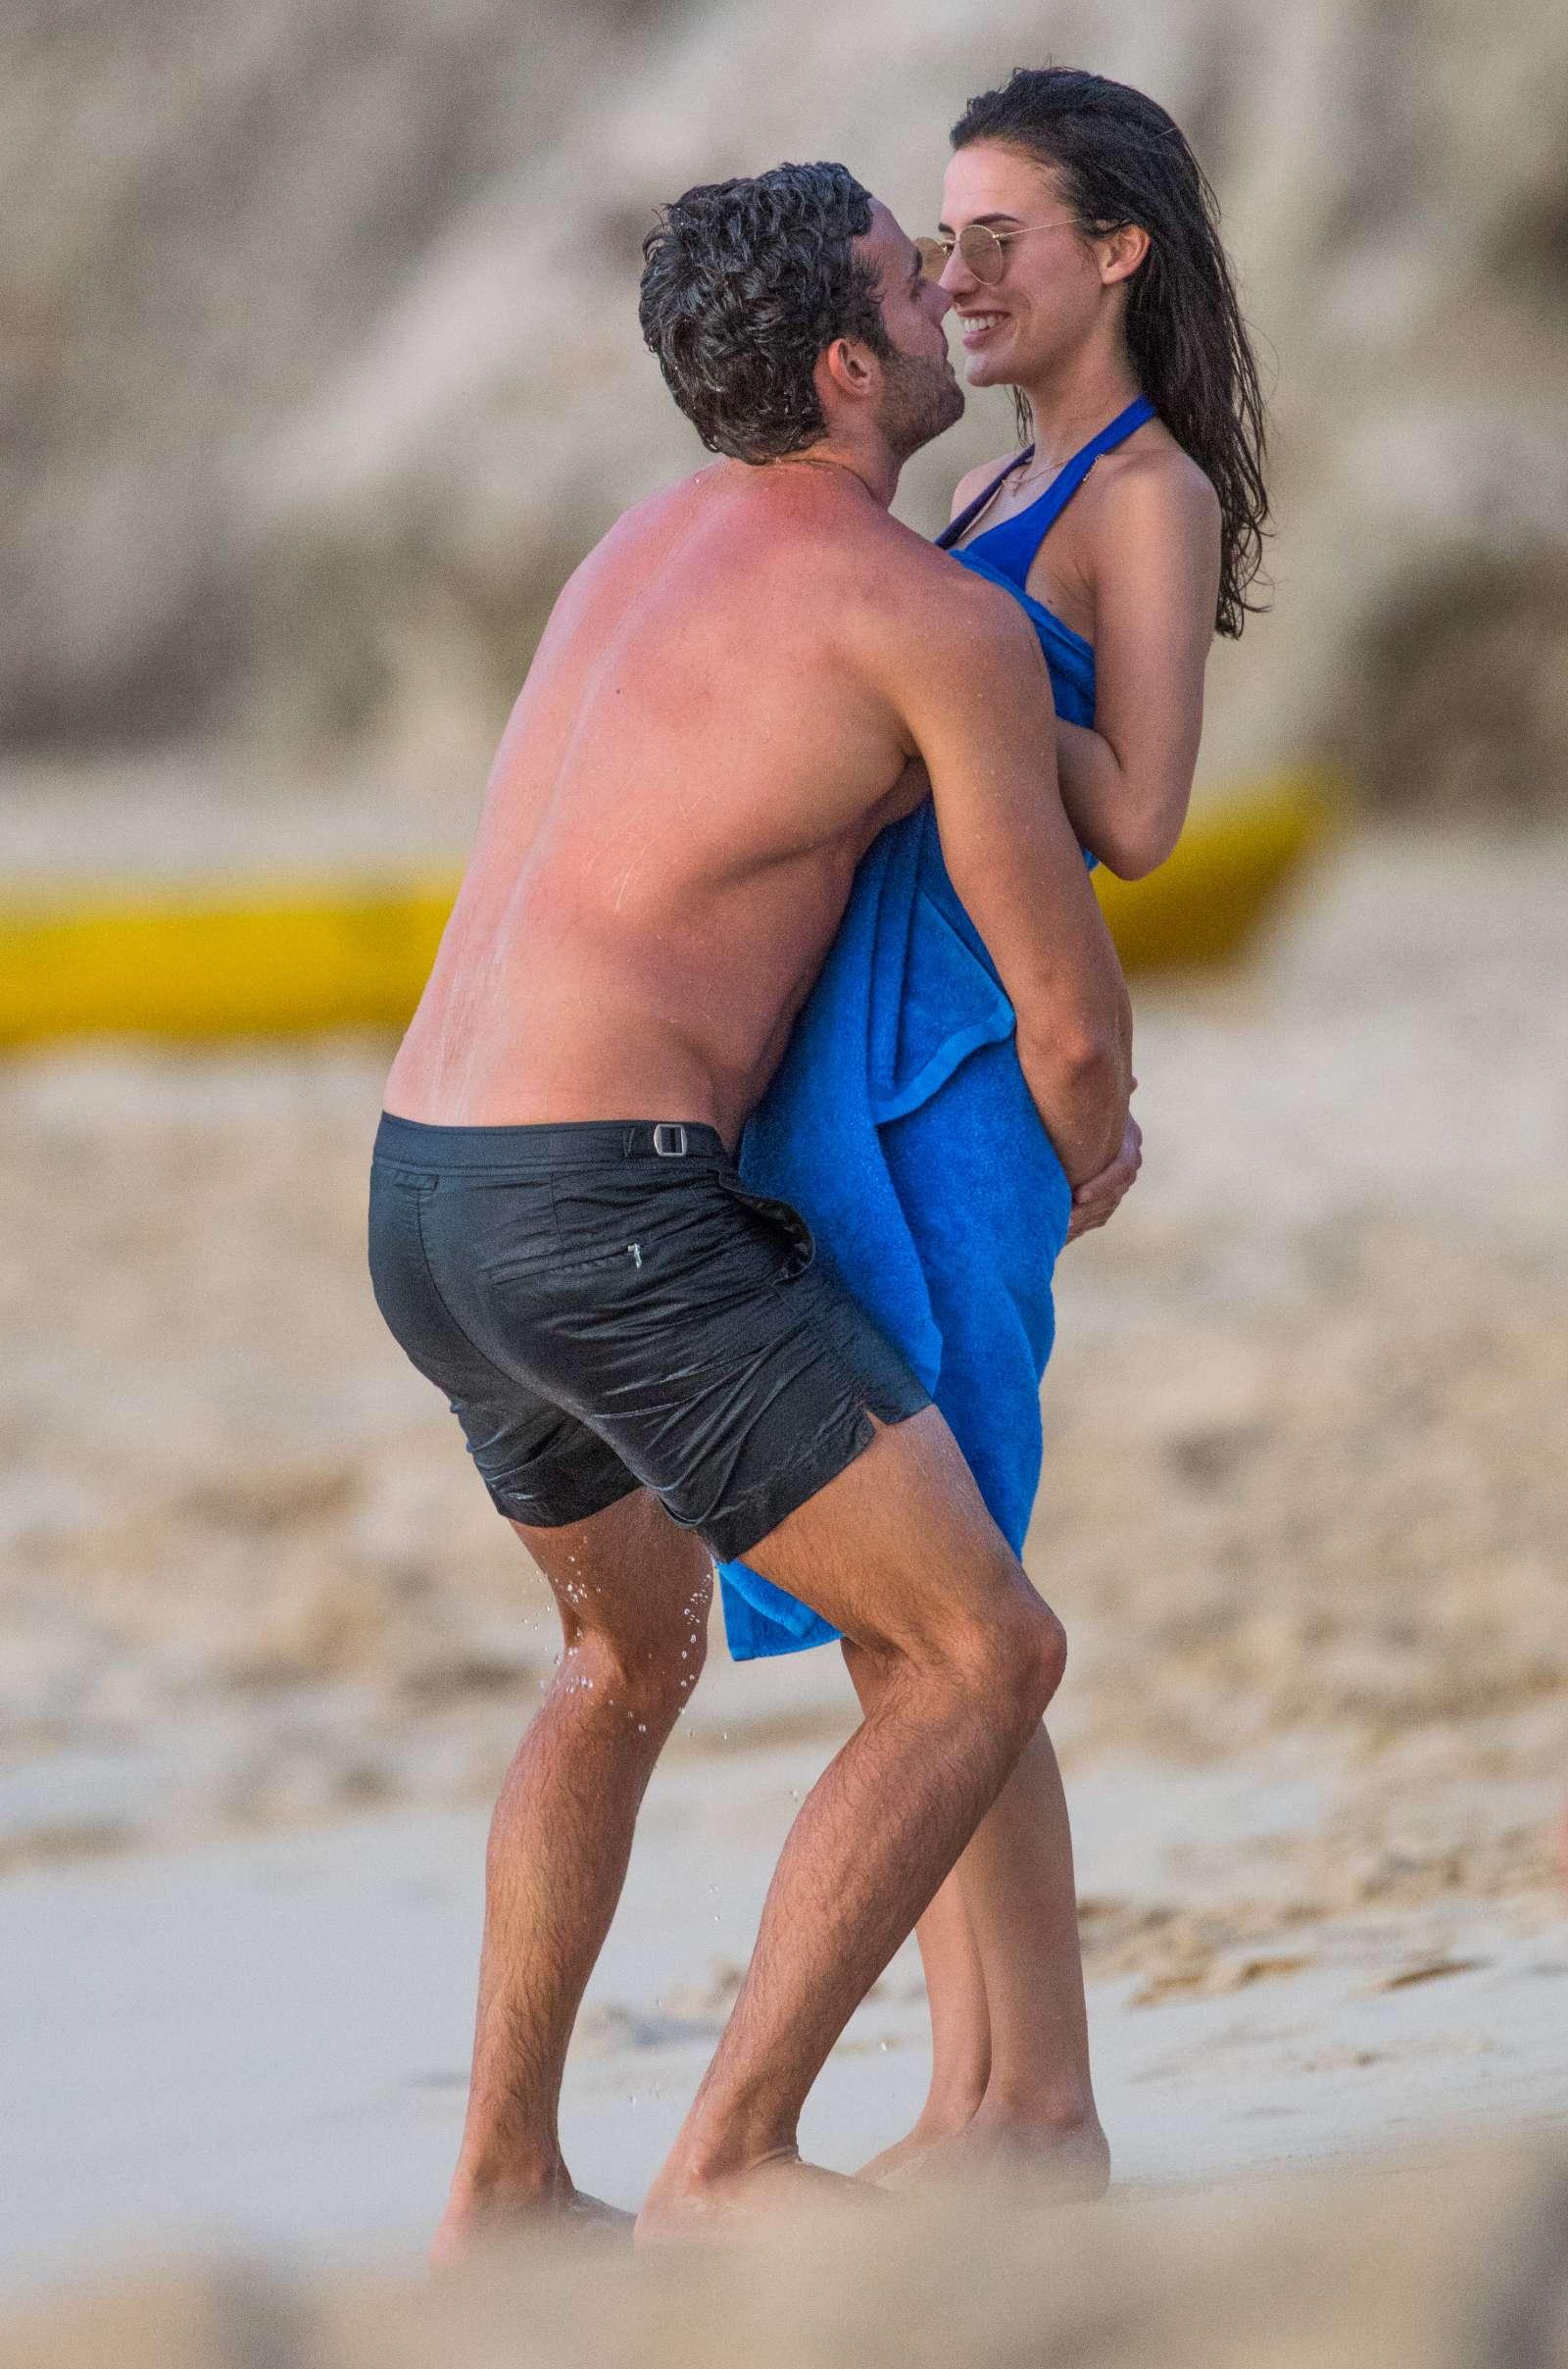 Selfie Josie Maran nude photos 2019